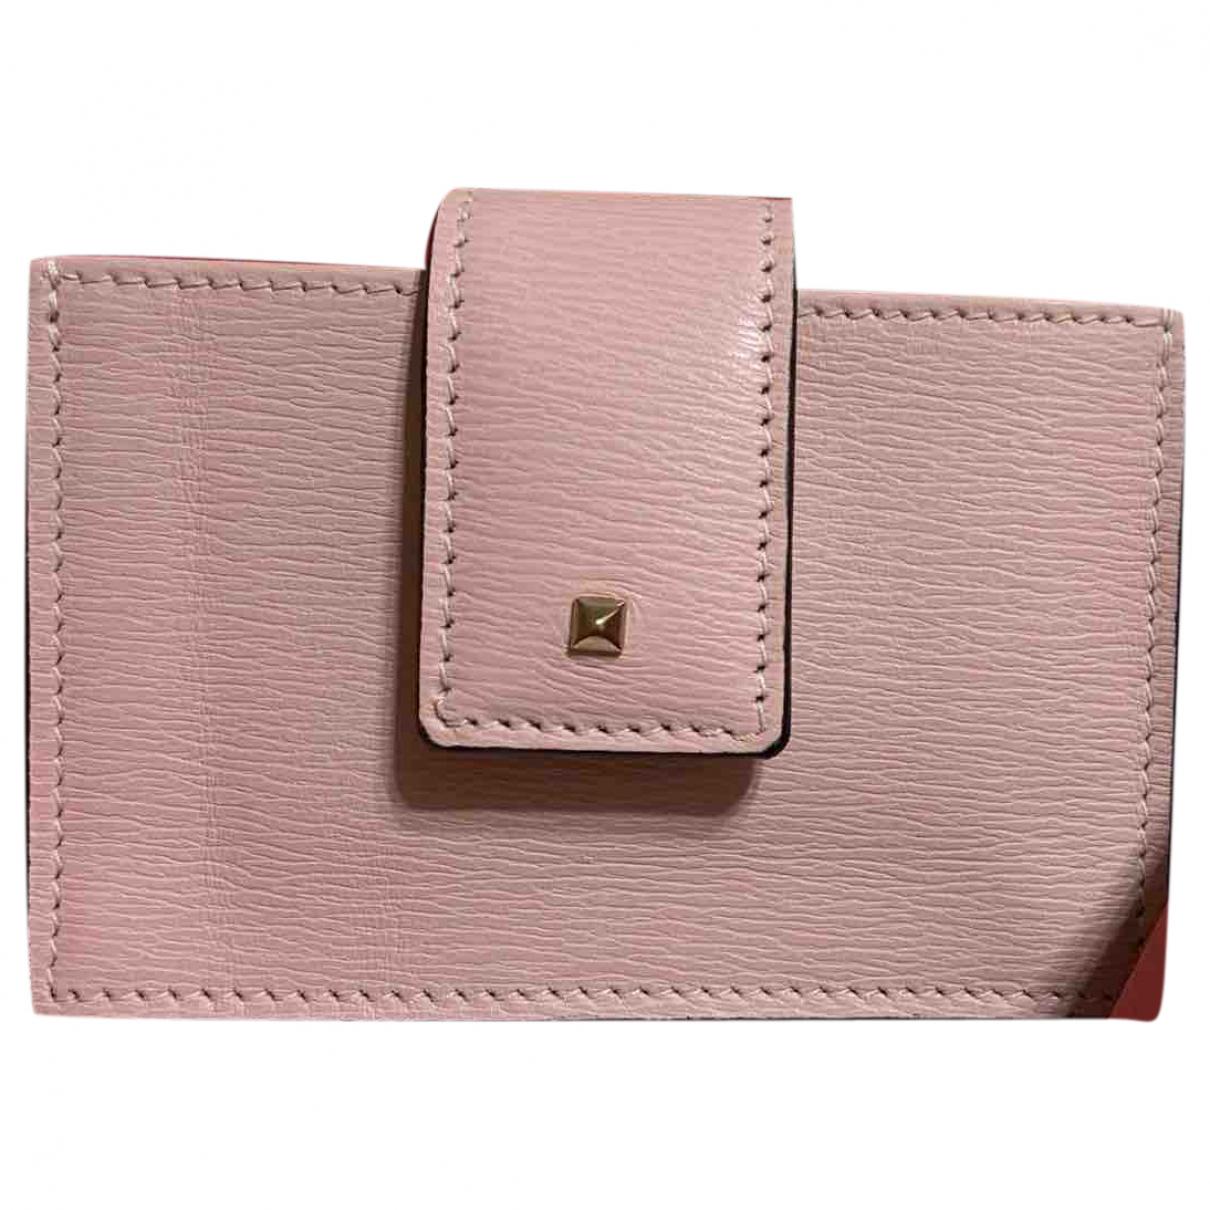 Valentino Garavani \N Pink Leather Purses, wallet & cases for Women \N